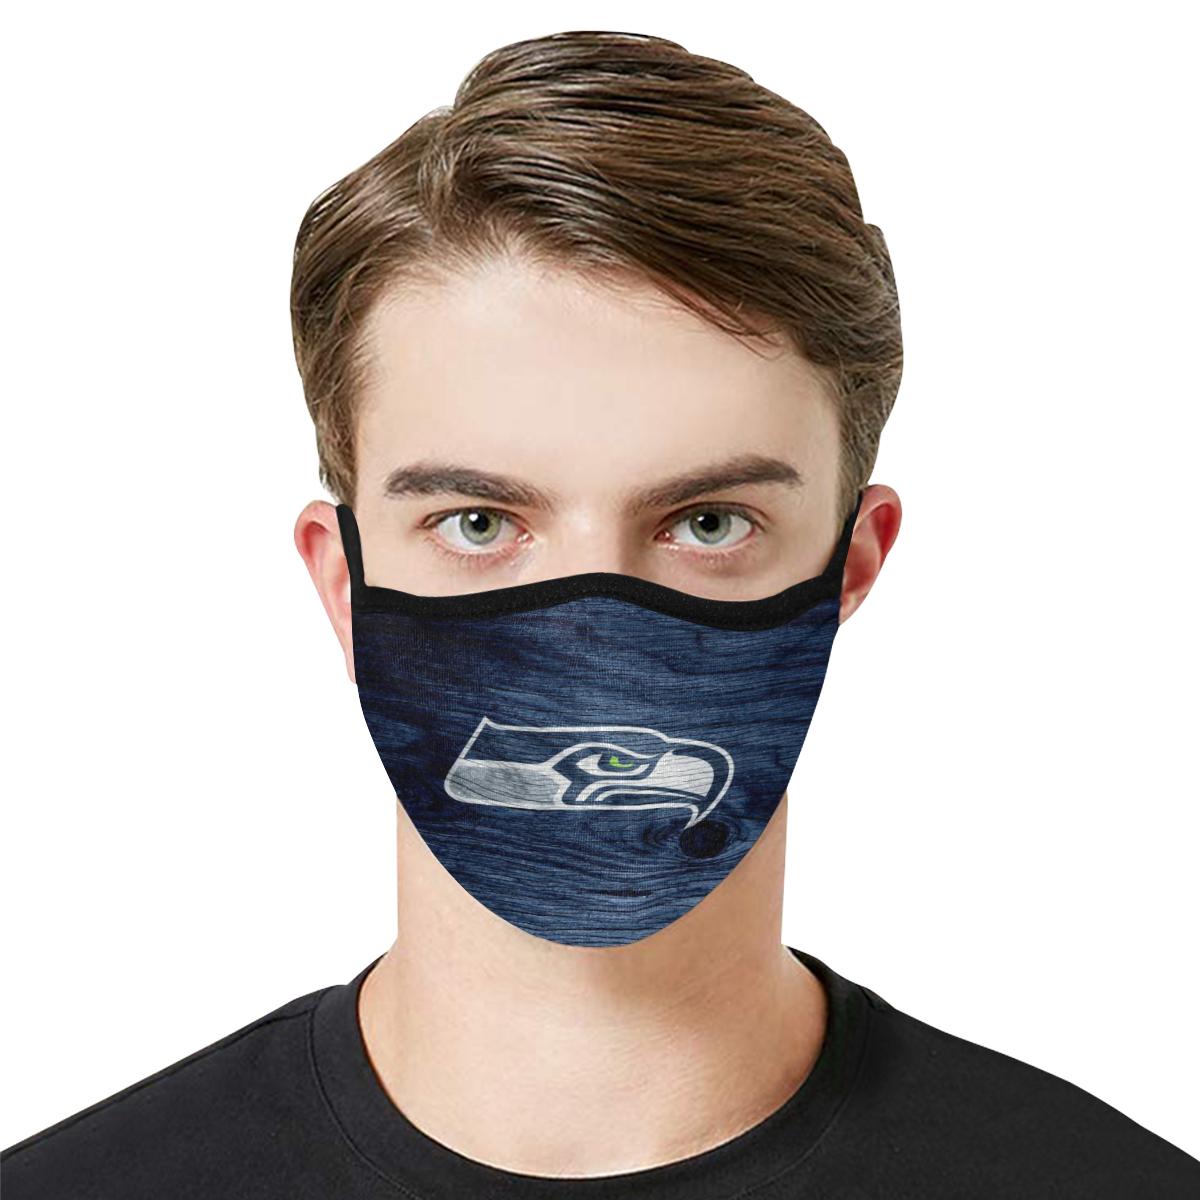 National football league seattle seahawks team cotton face mask 1